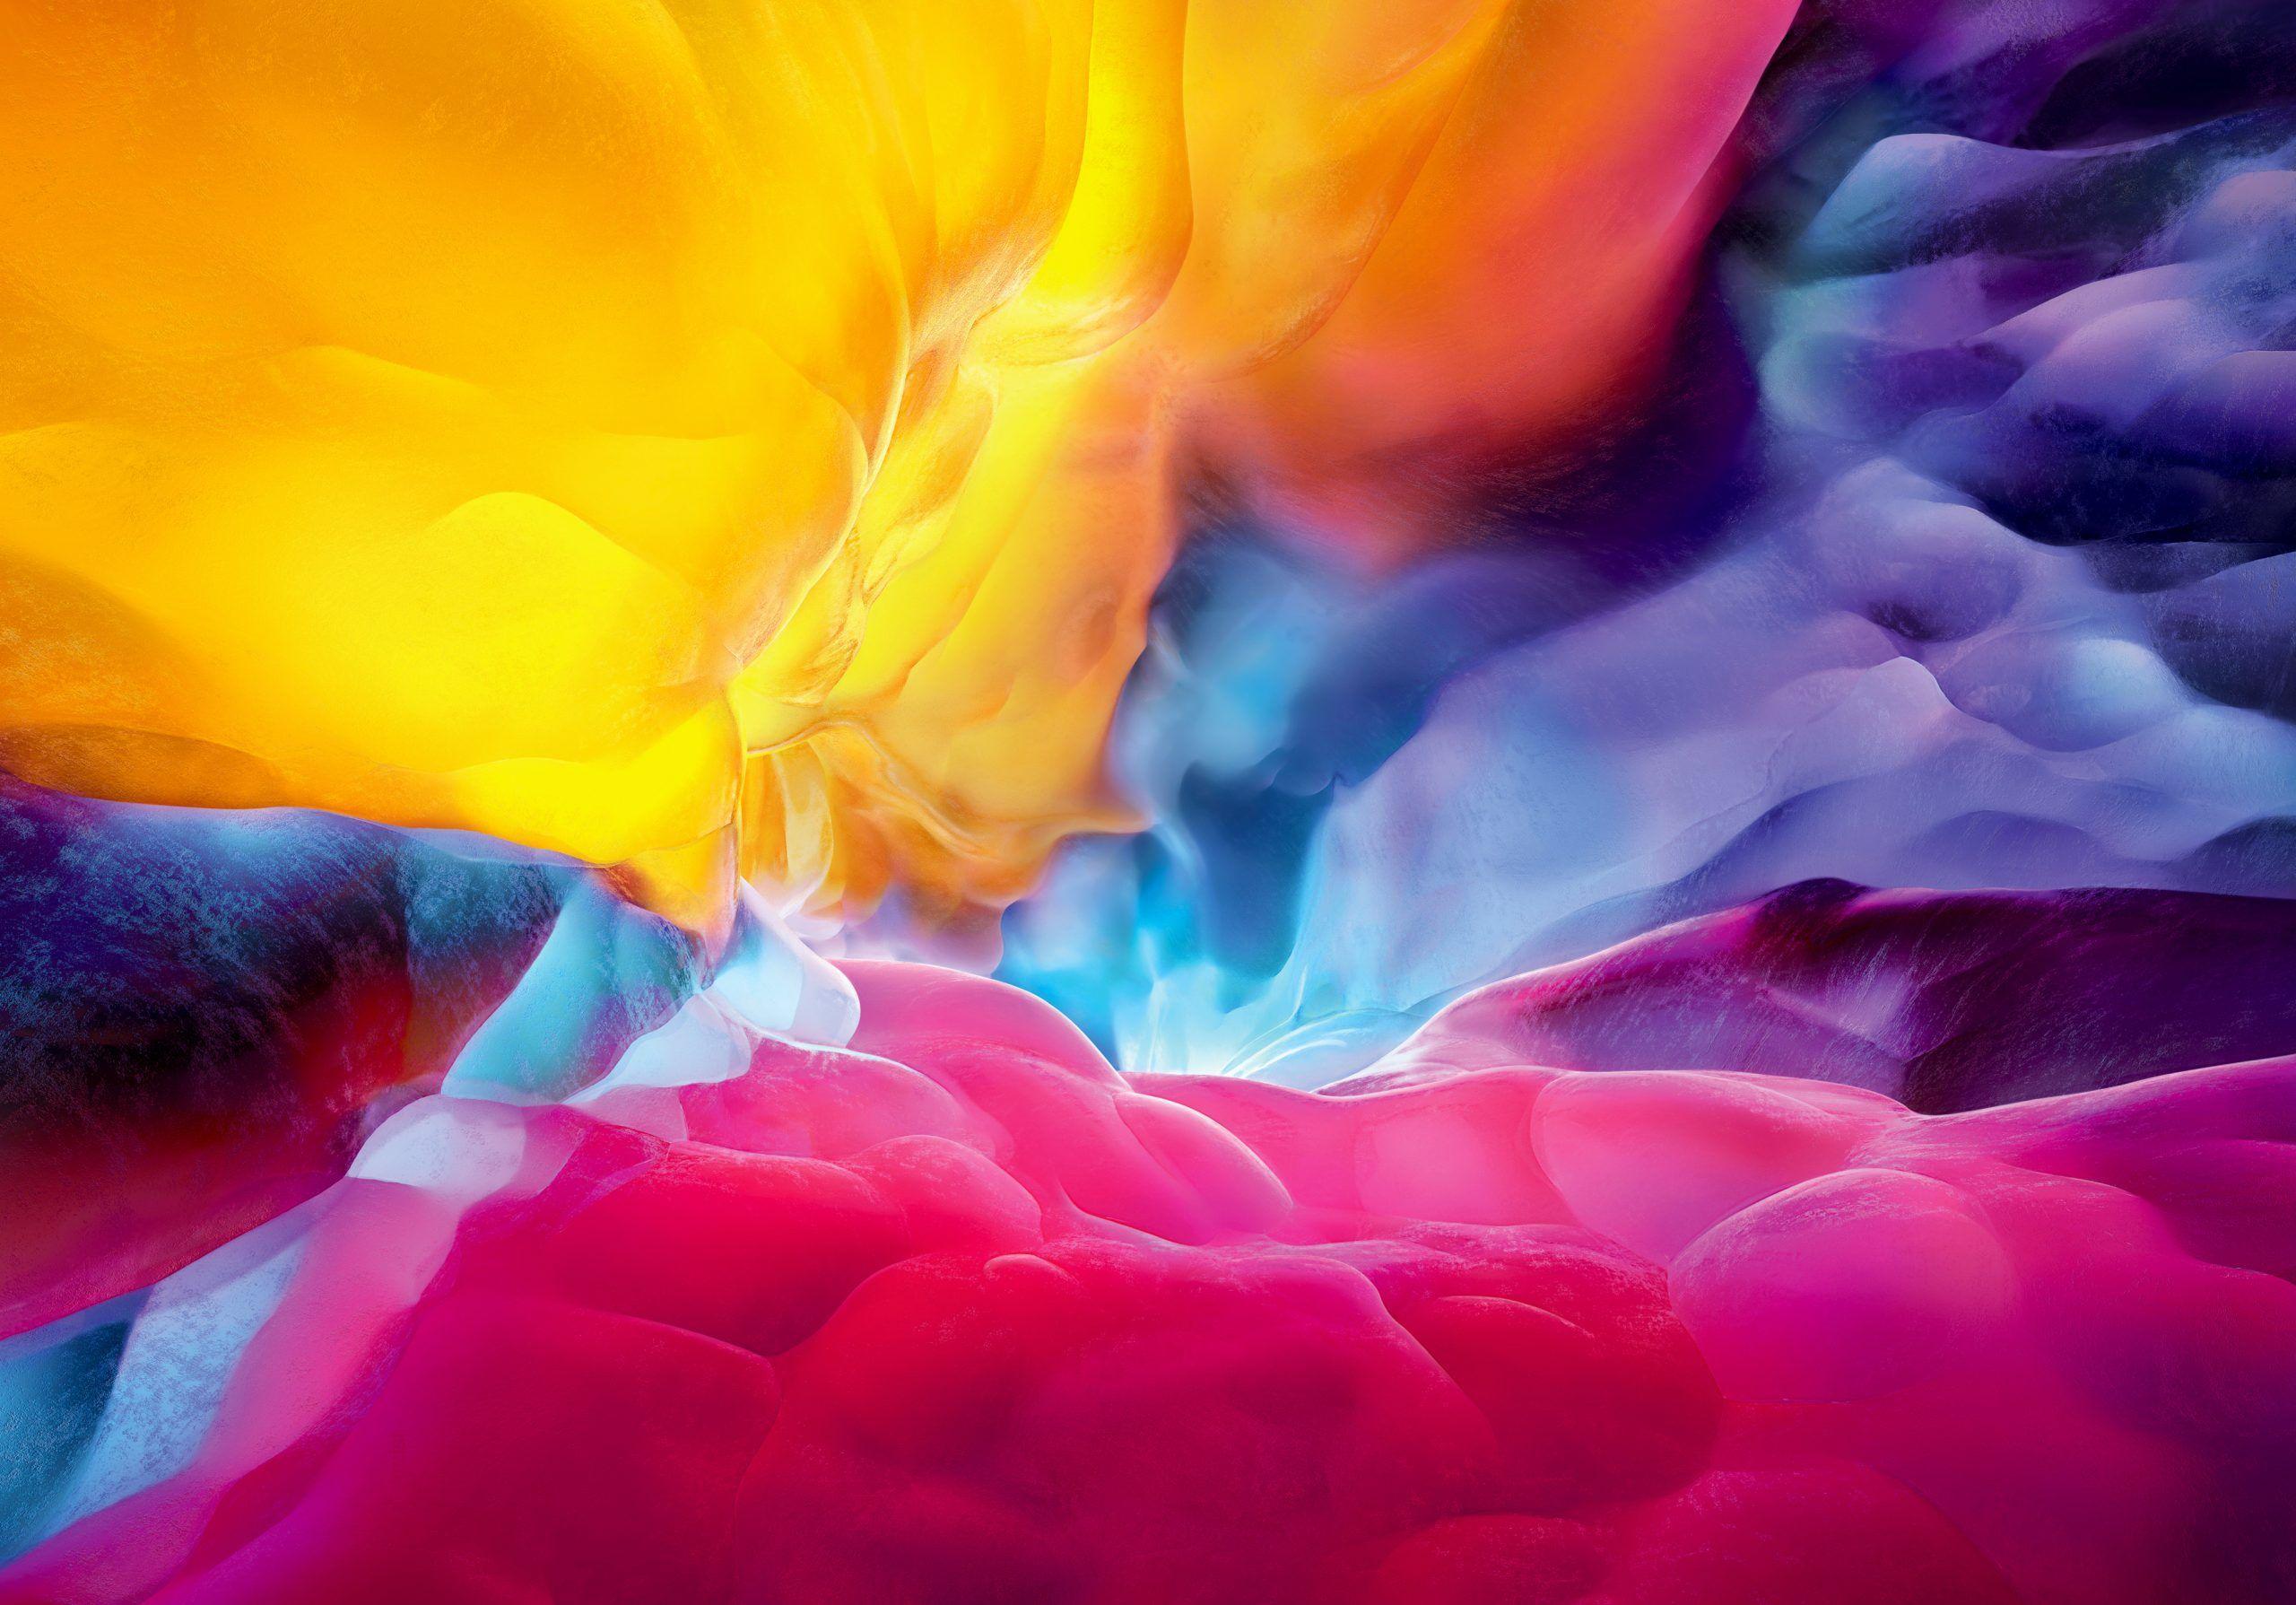 Ipad 2020 Wallpapers Top Free Ipad 2020 Backgrounds Wallpaperaccess